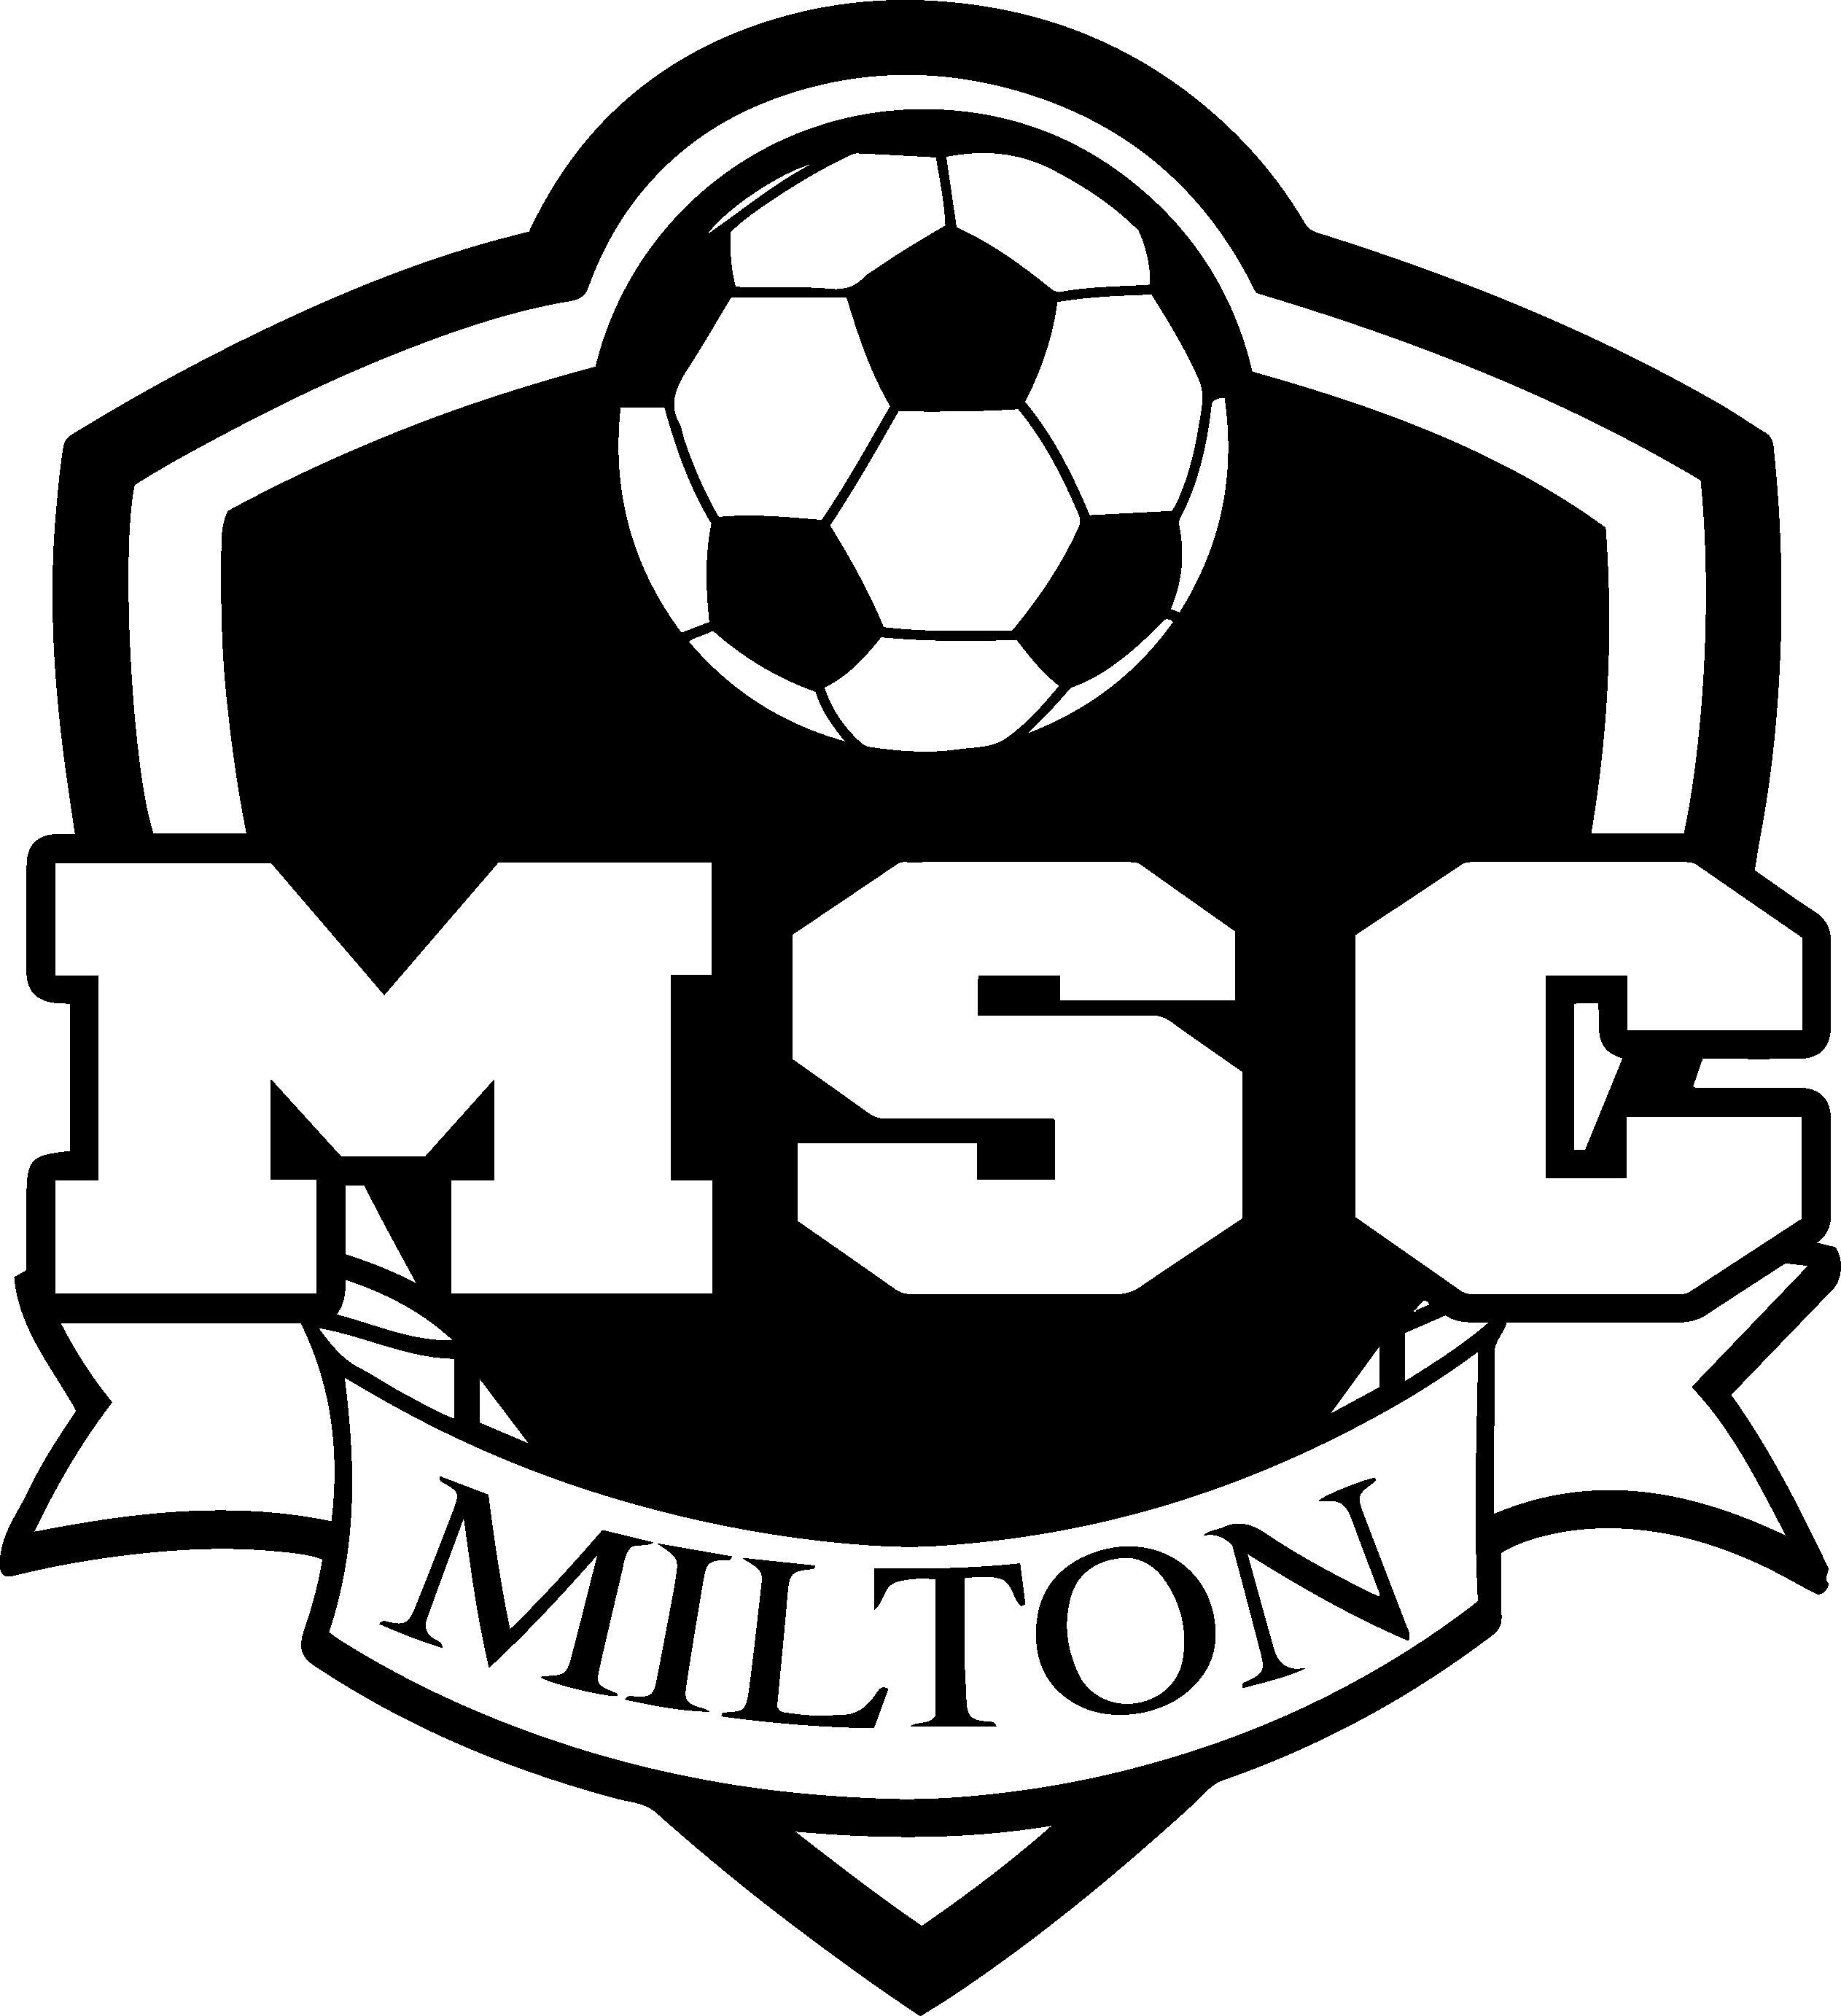 miltonsoccer header logo2